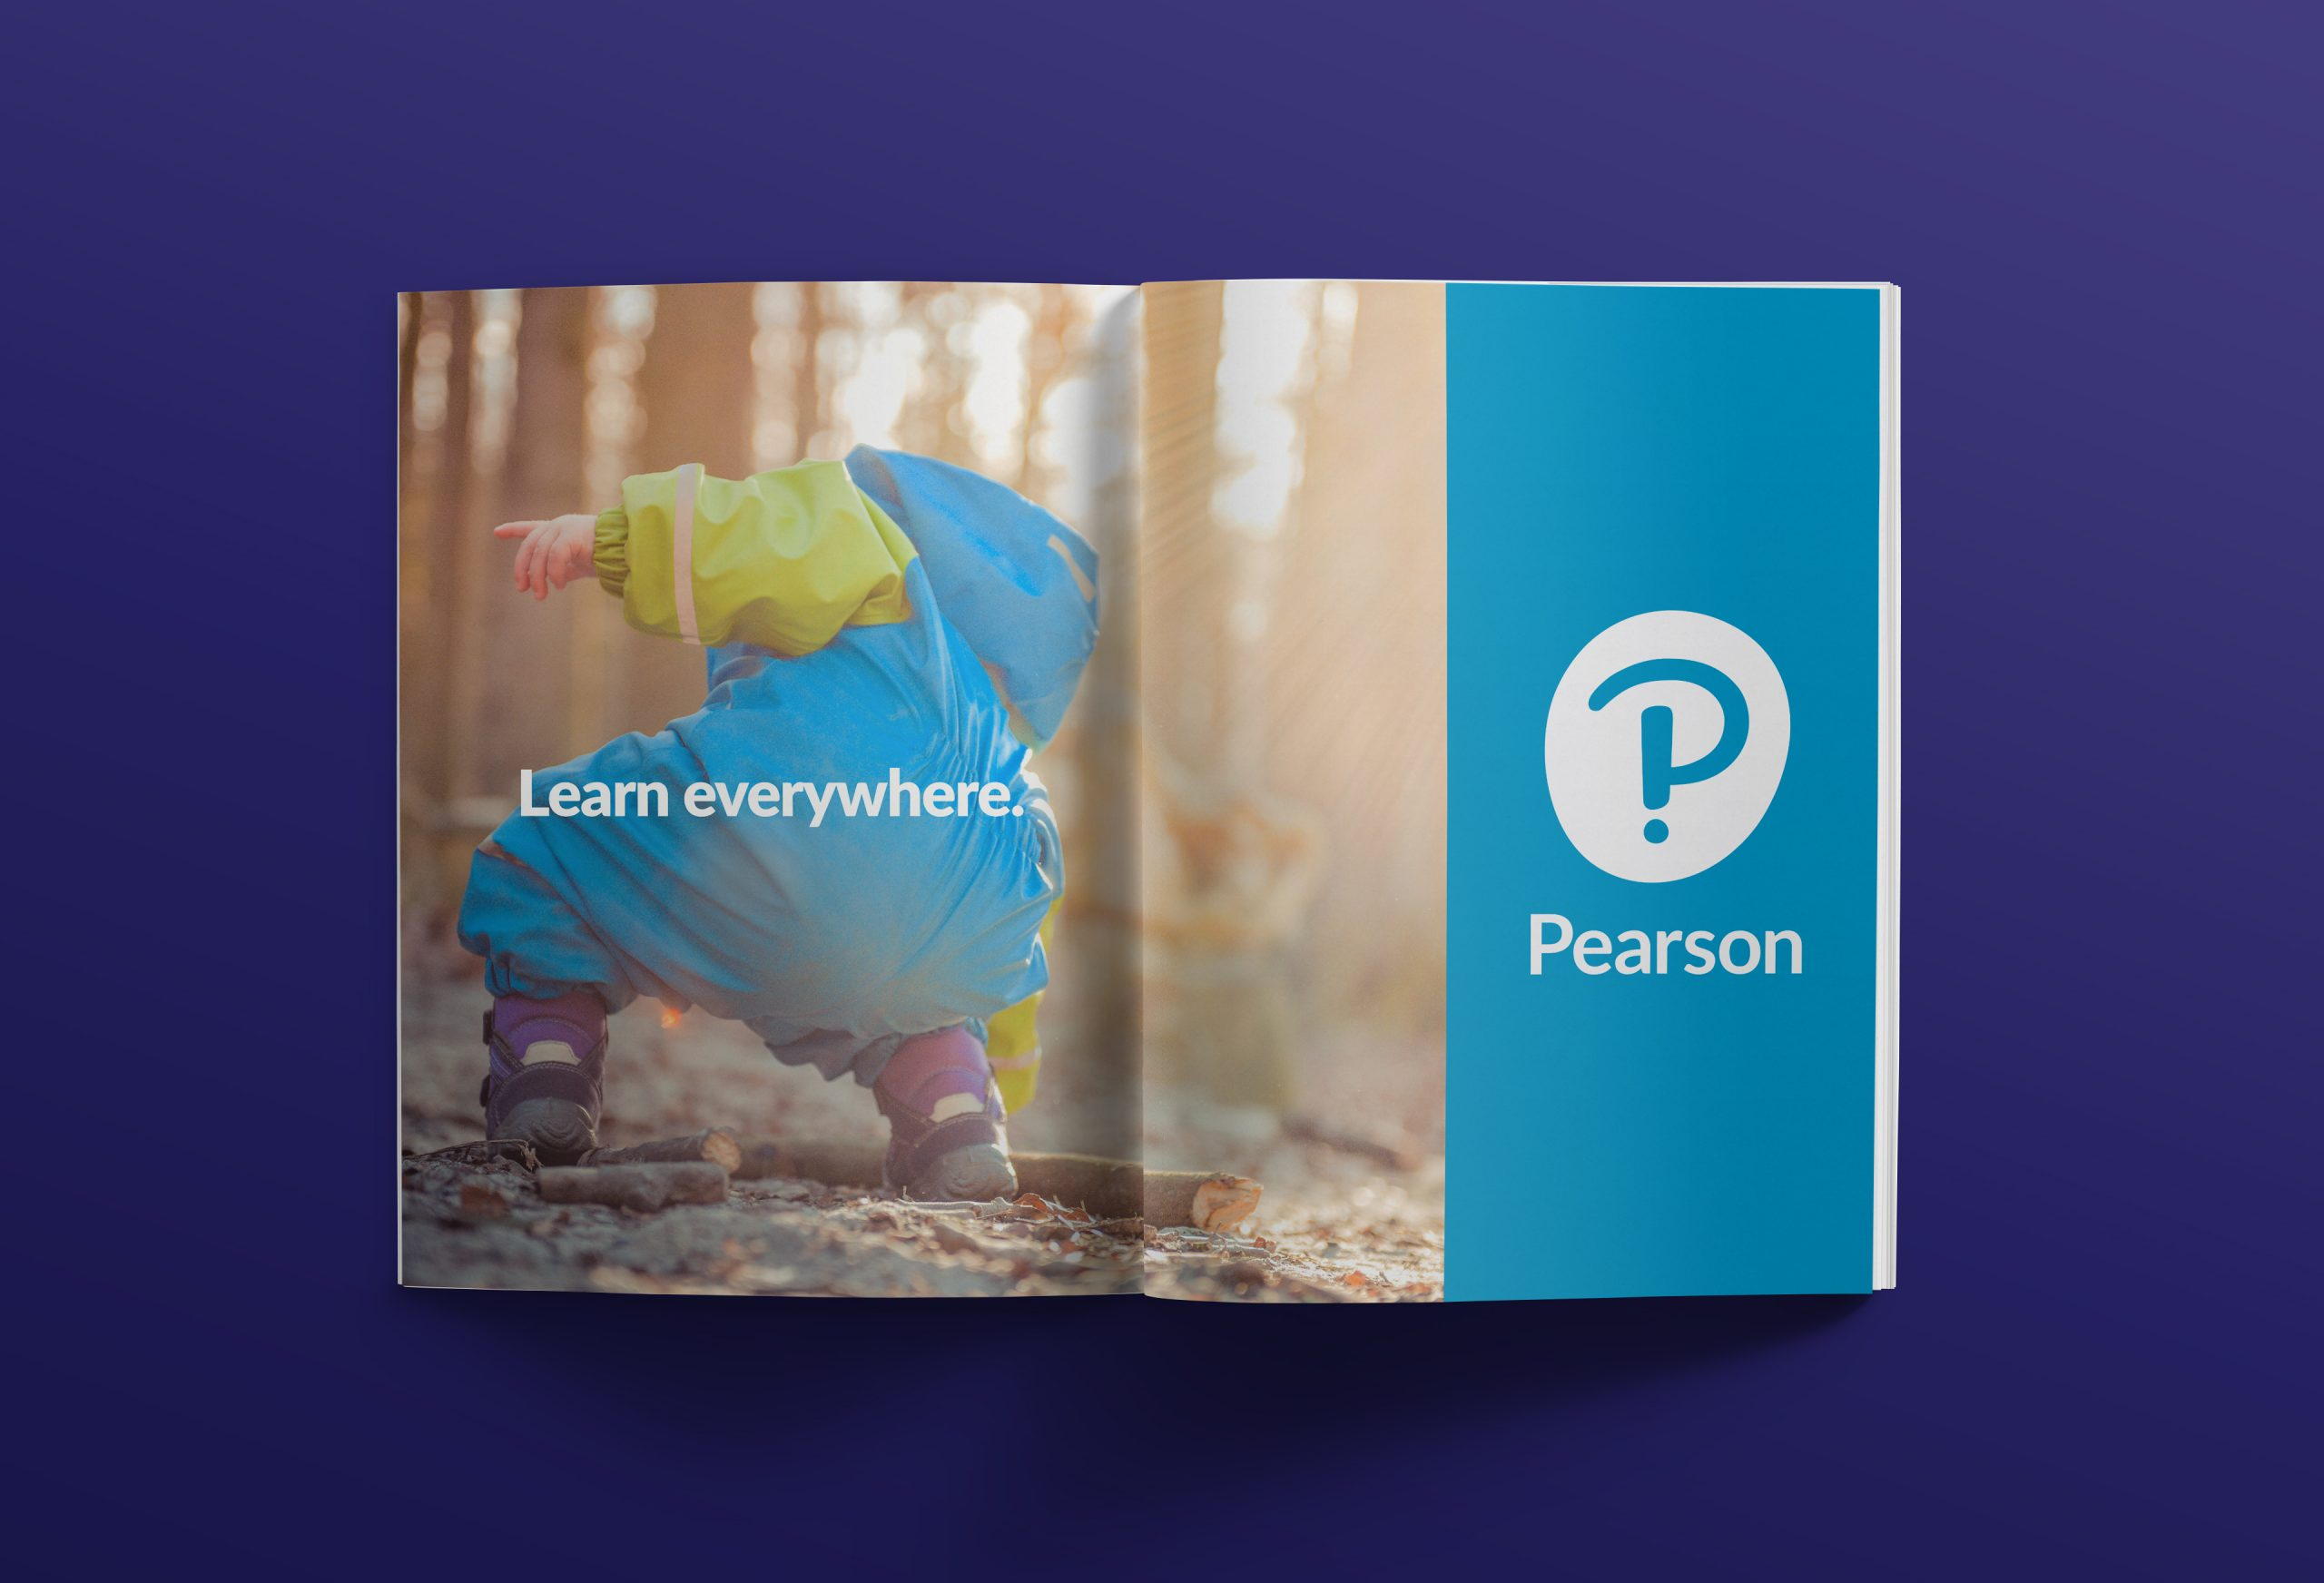 PearsonLogoMagazineAd01